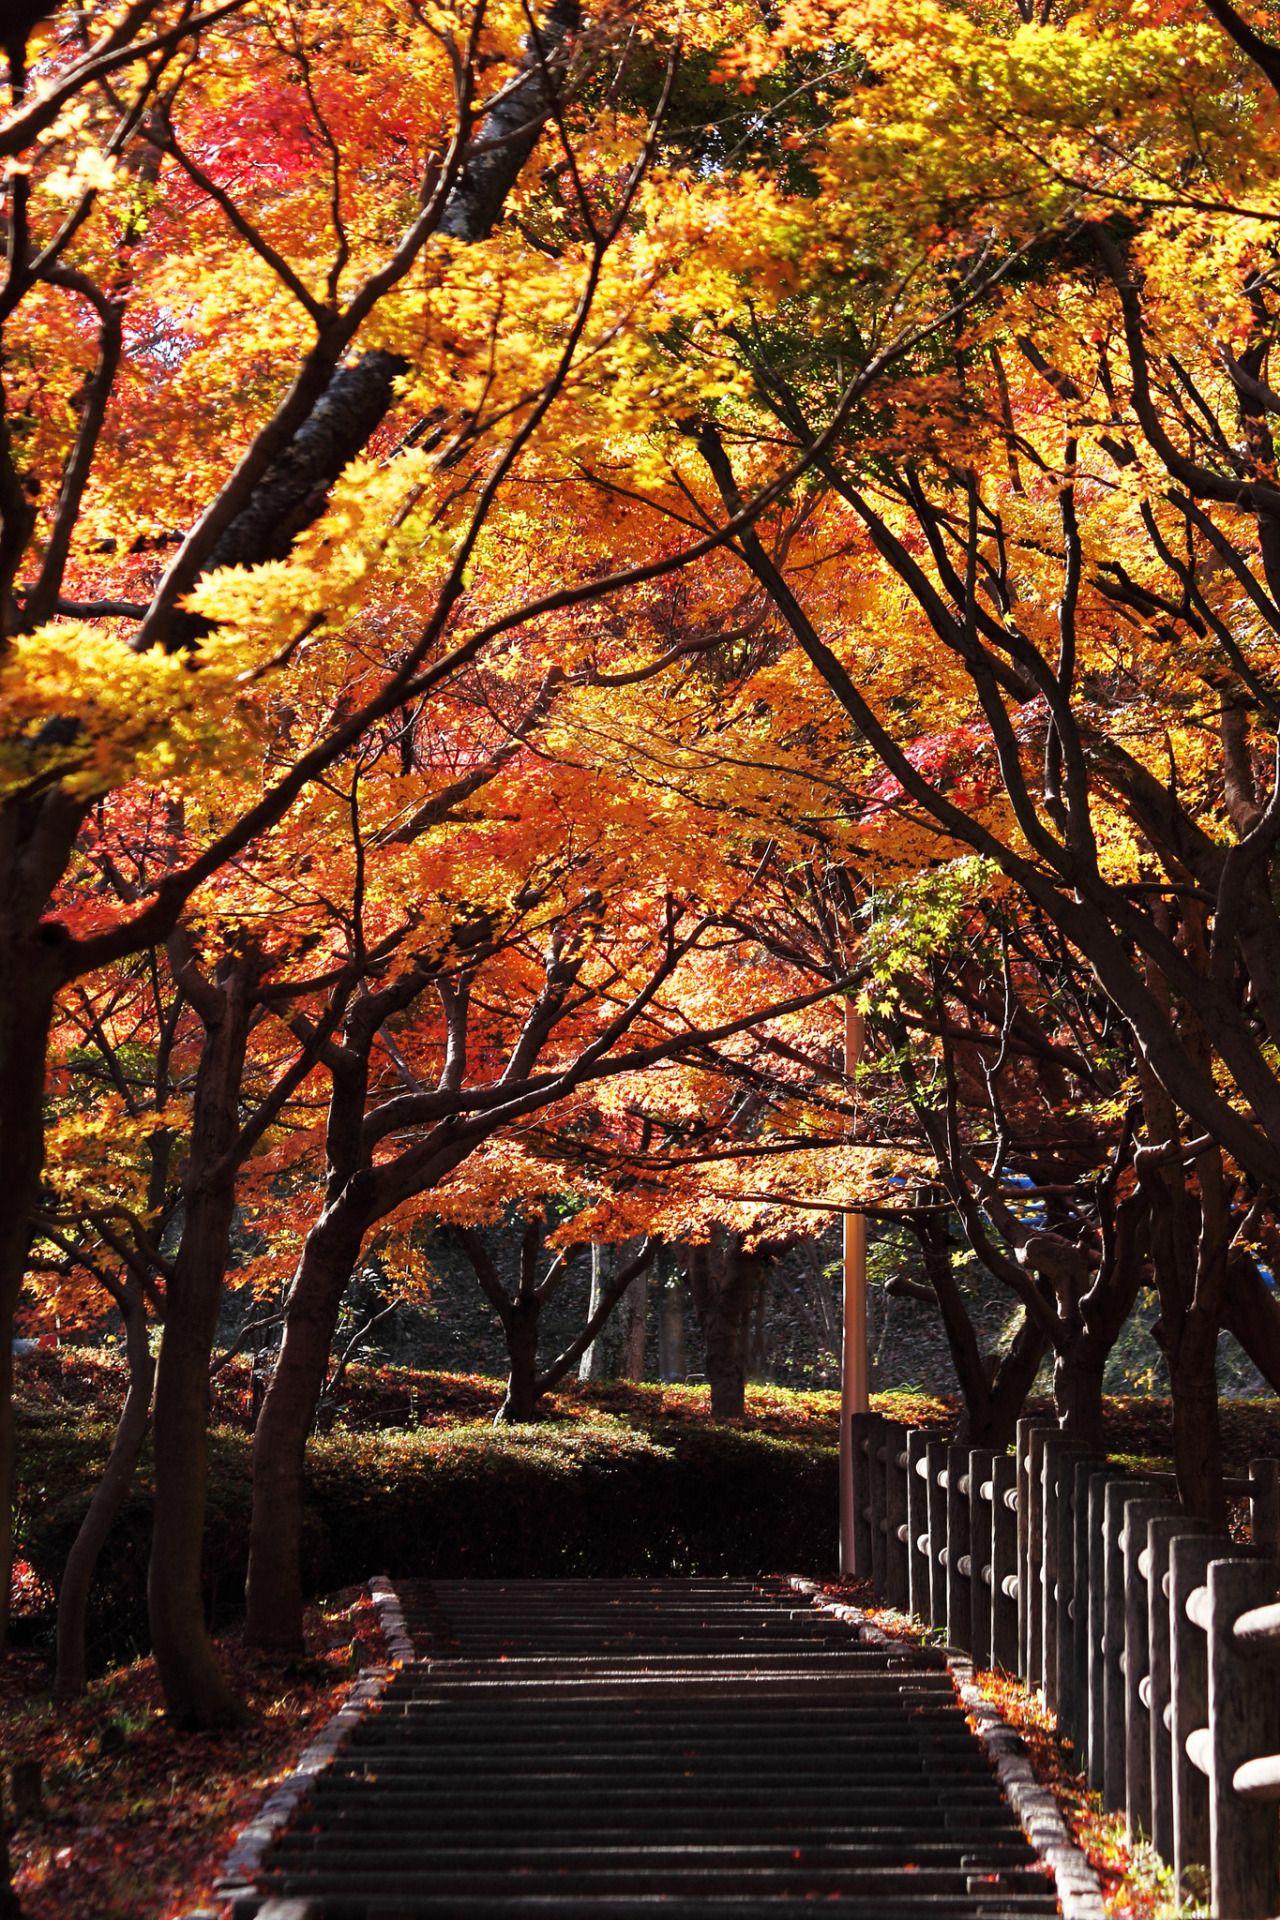 Autumn aesthetic, autumn vibes, fall vibes, fall aesthetic